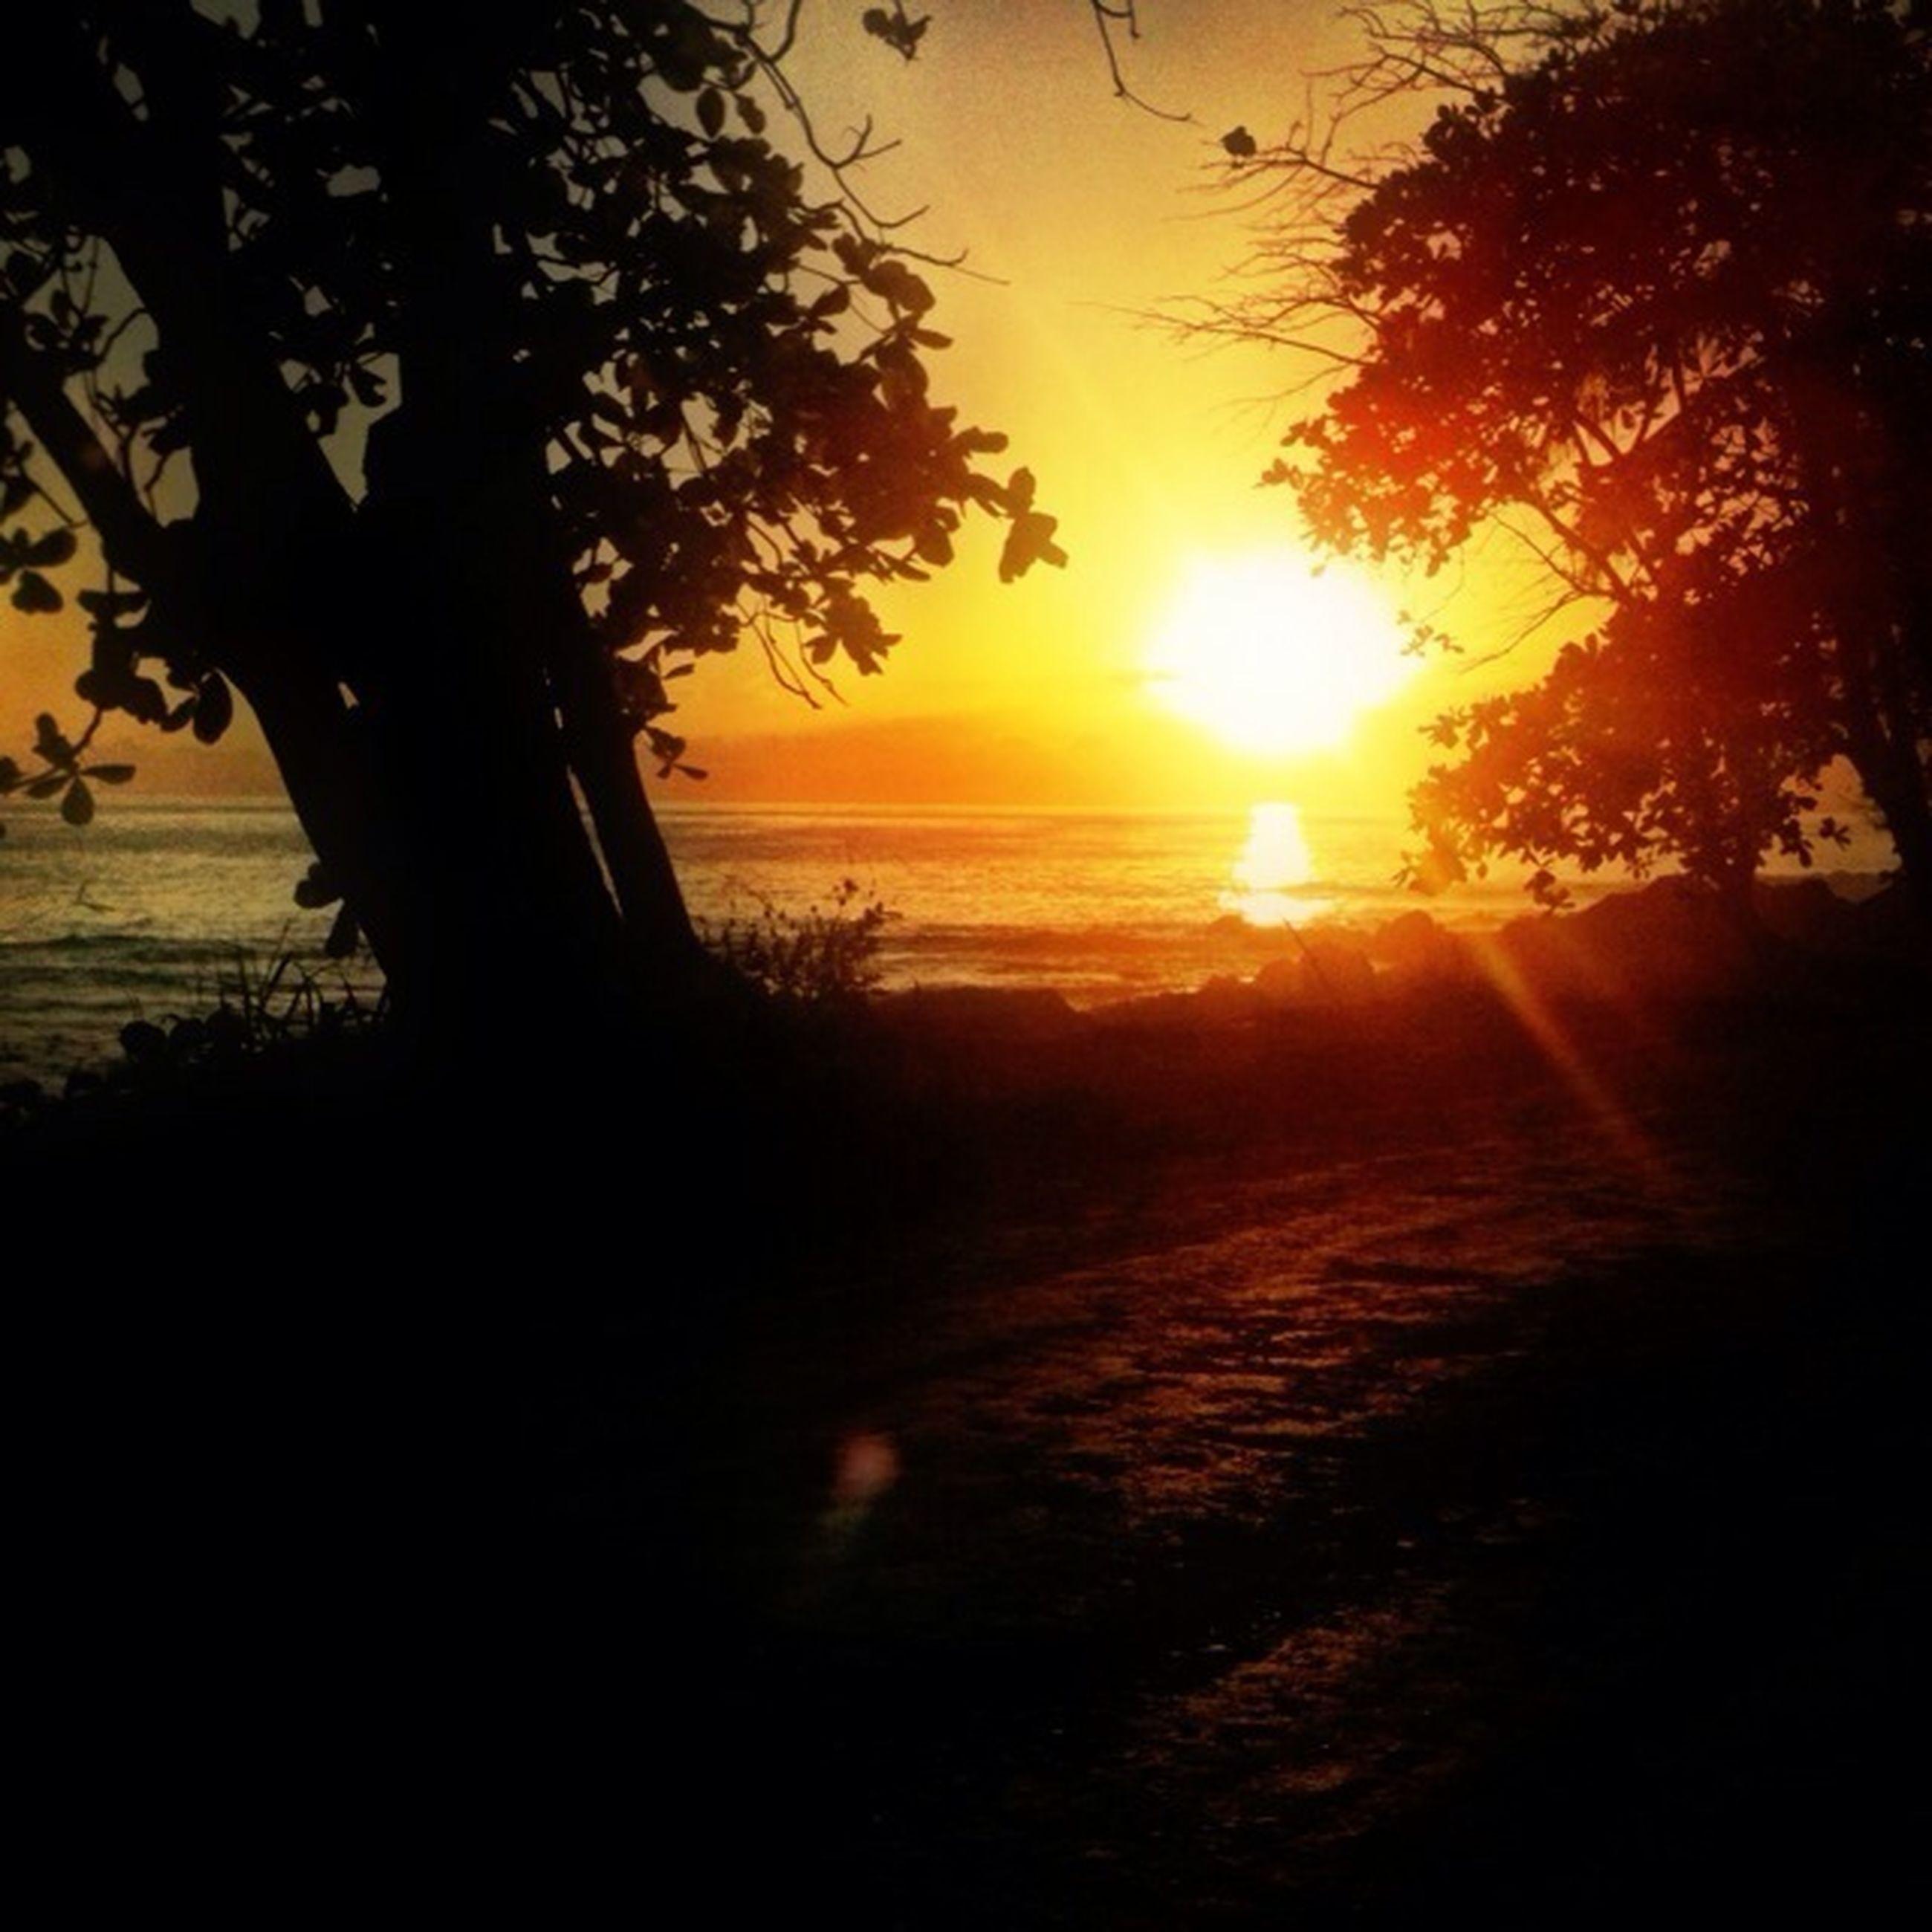 sunset, silhouette, tranquil scene, tranquility, sun, scenics, tree, beauty in nature, orange color, sky, nature, water, sea, idyllic, horizon over water, sunlight, branch, non-urban scene, tree trunk, beach